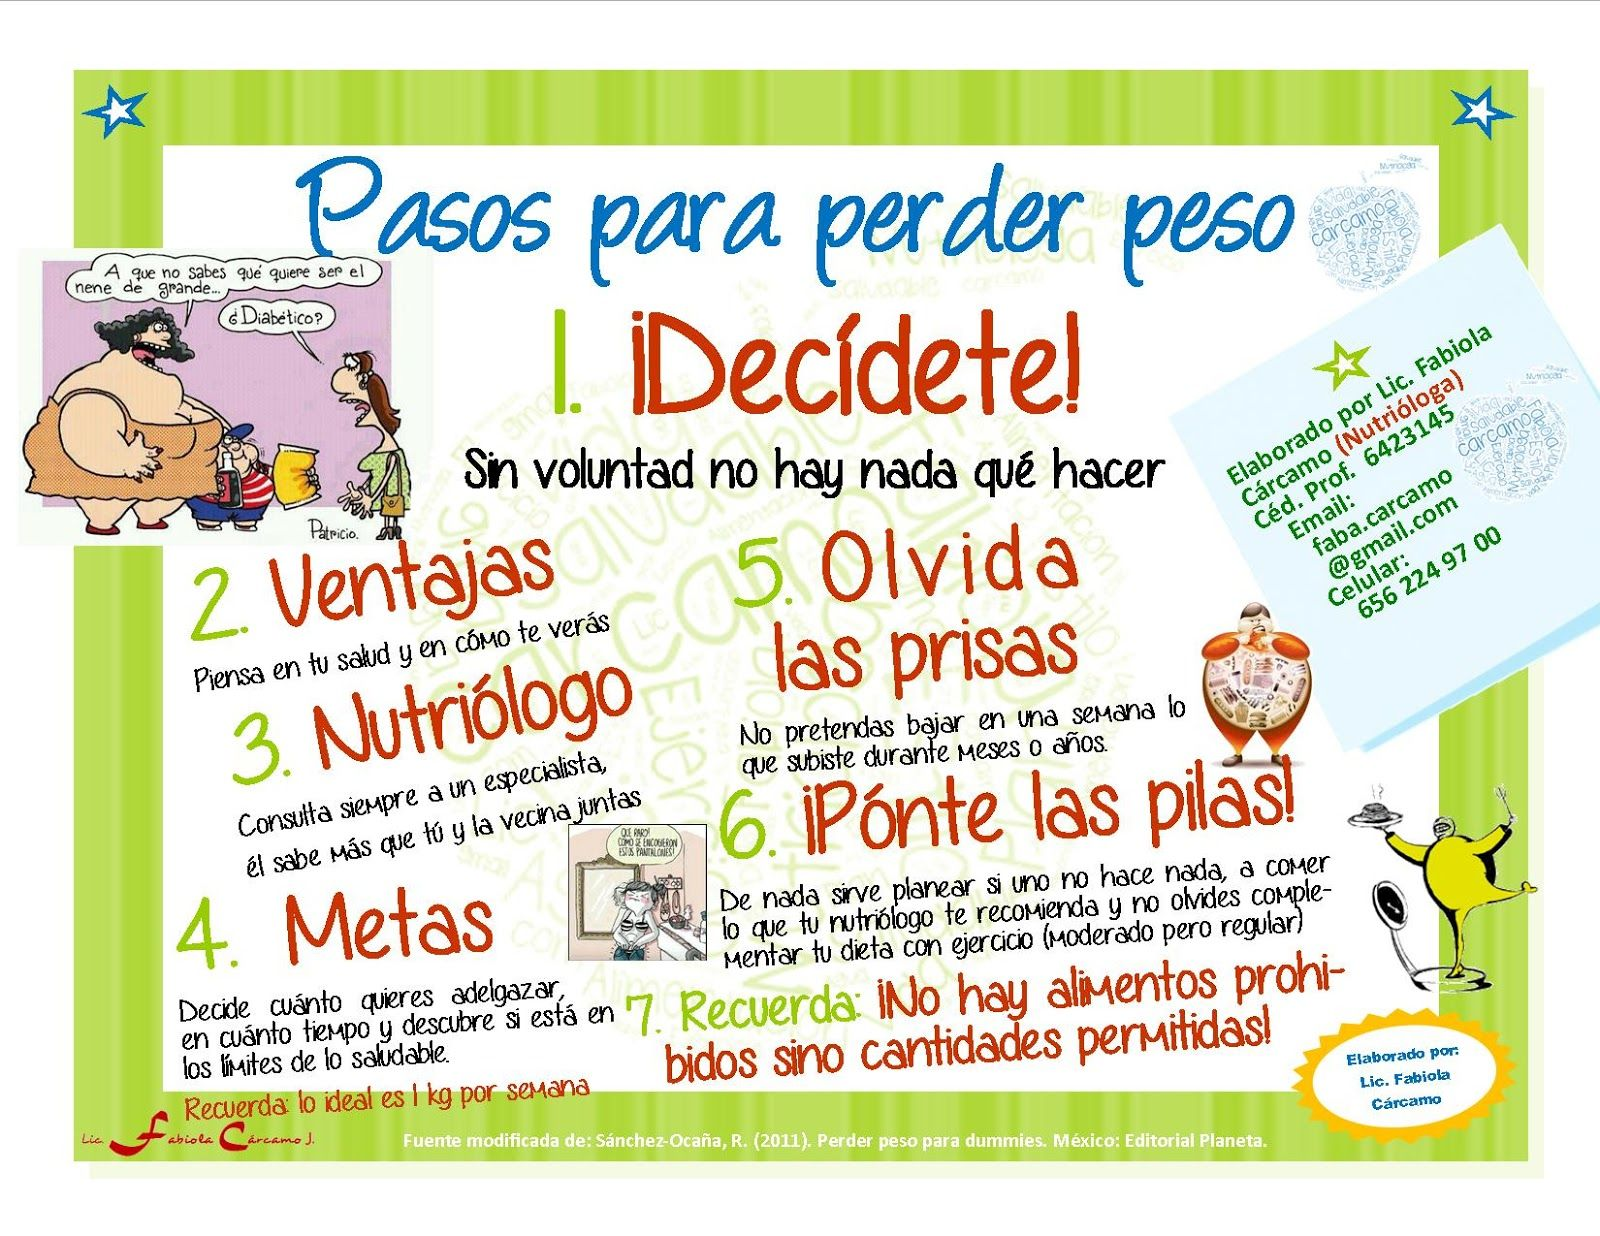 Nutrinotas junio 2013 pasos para perder peso - Alimentos para perder peso ...